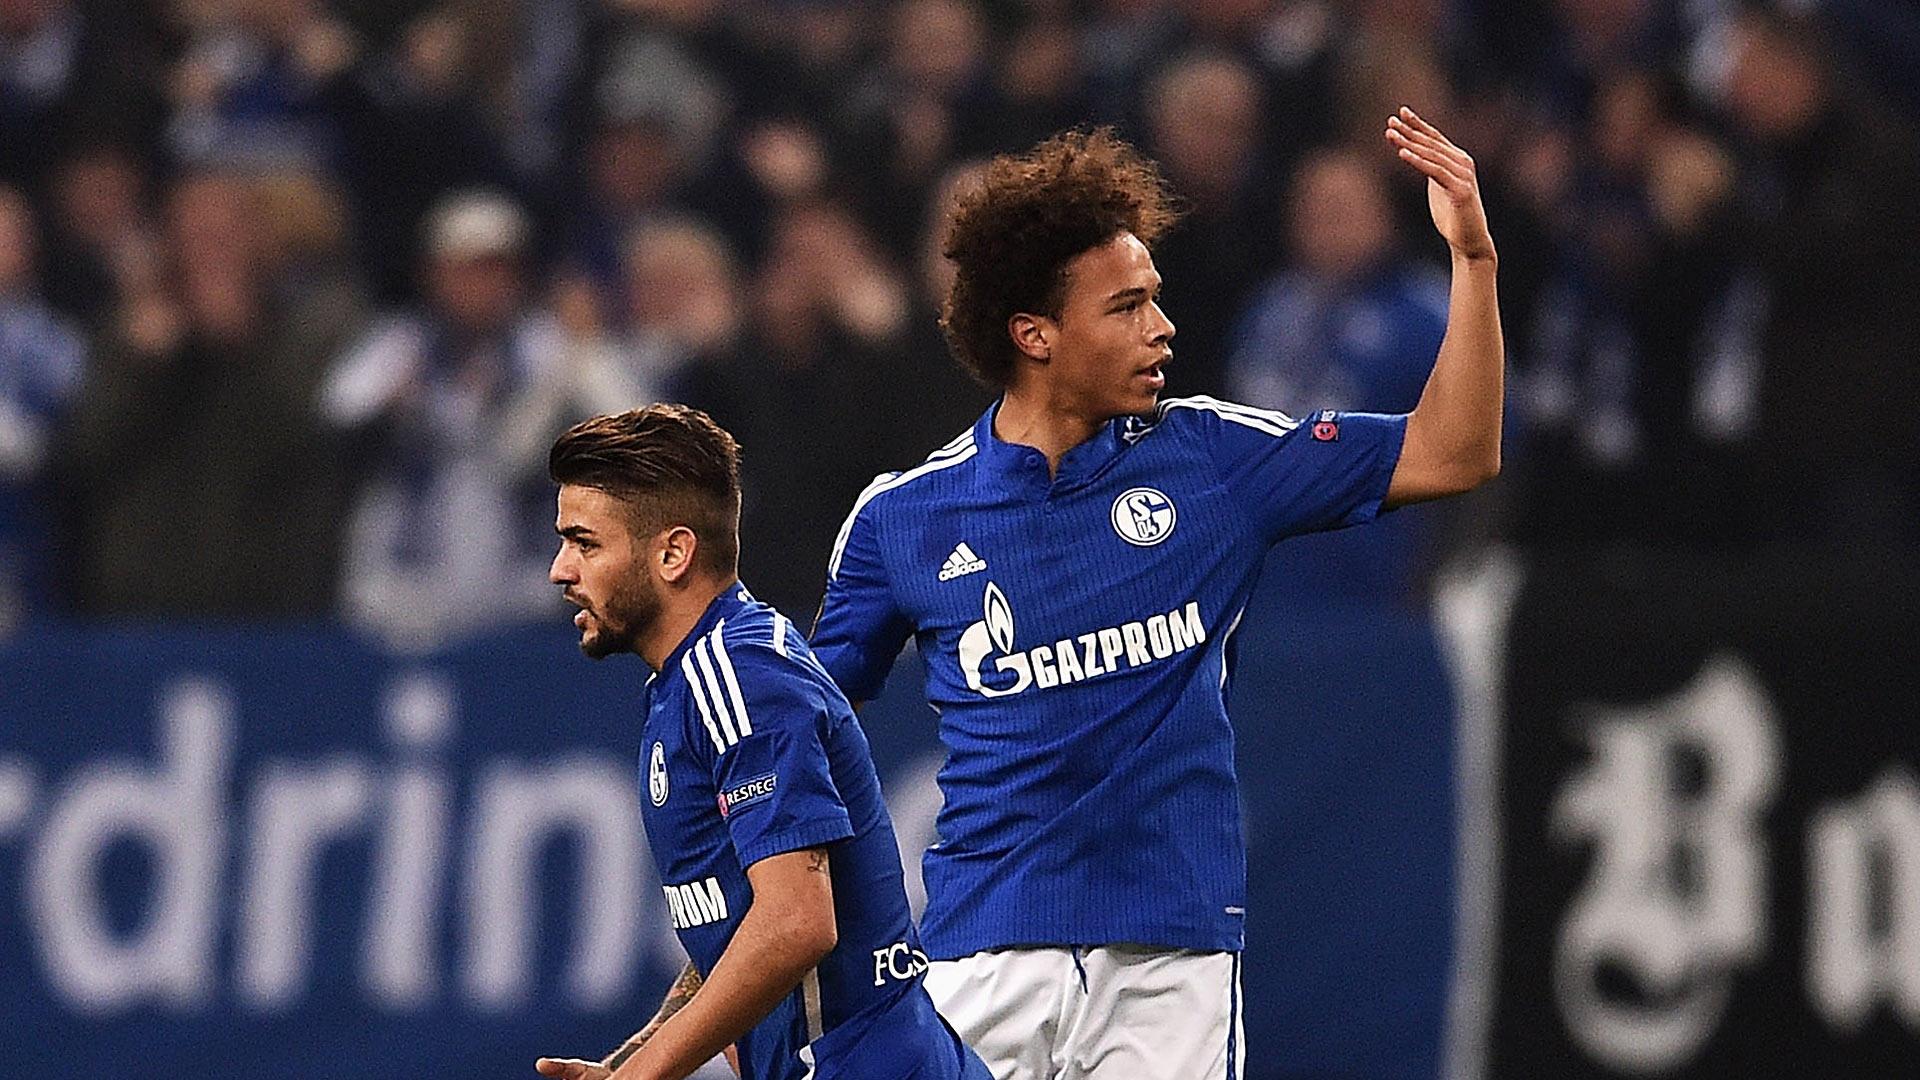 Video: Schalke 04 vs Sparta Praha